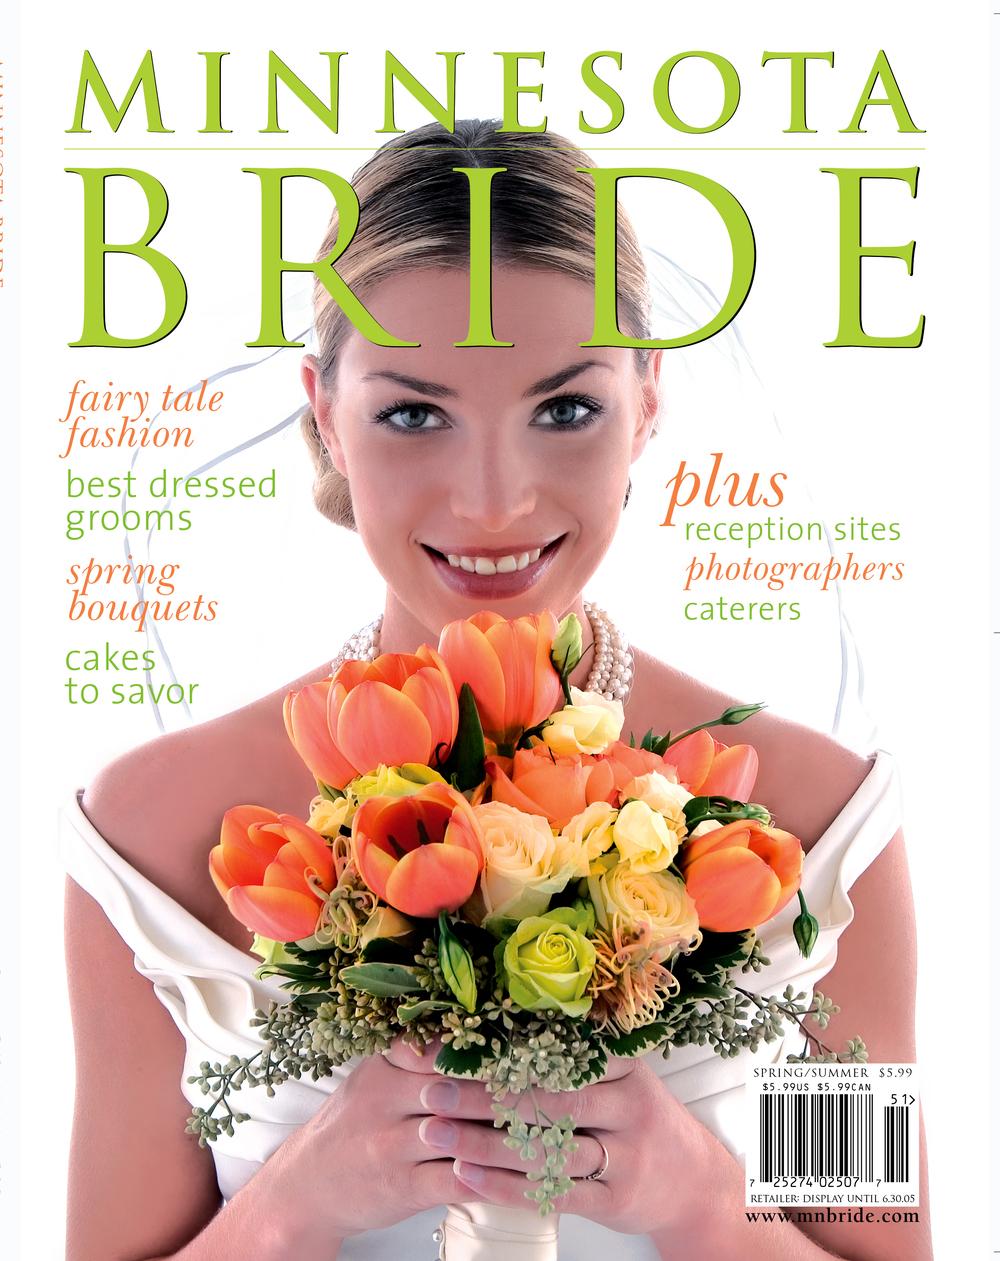 Minnesota Bride, Spring 2005